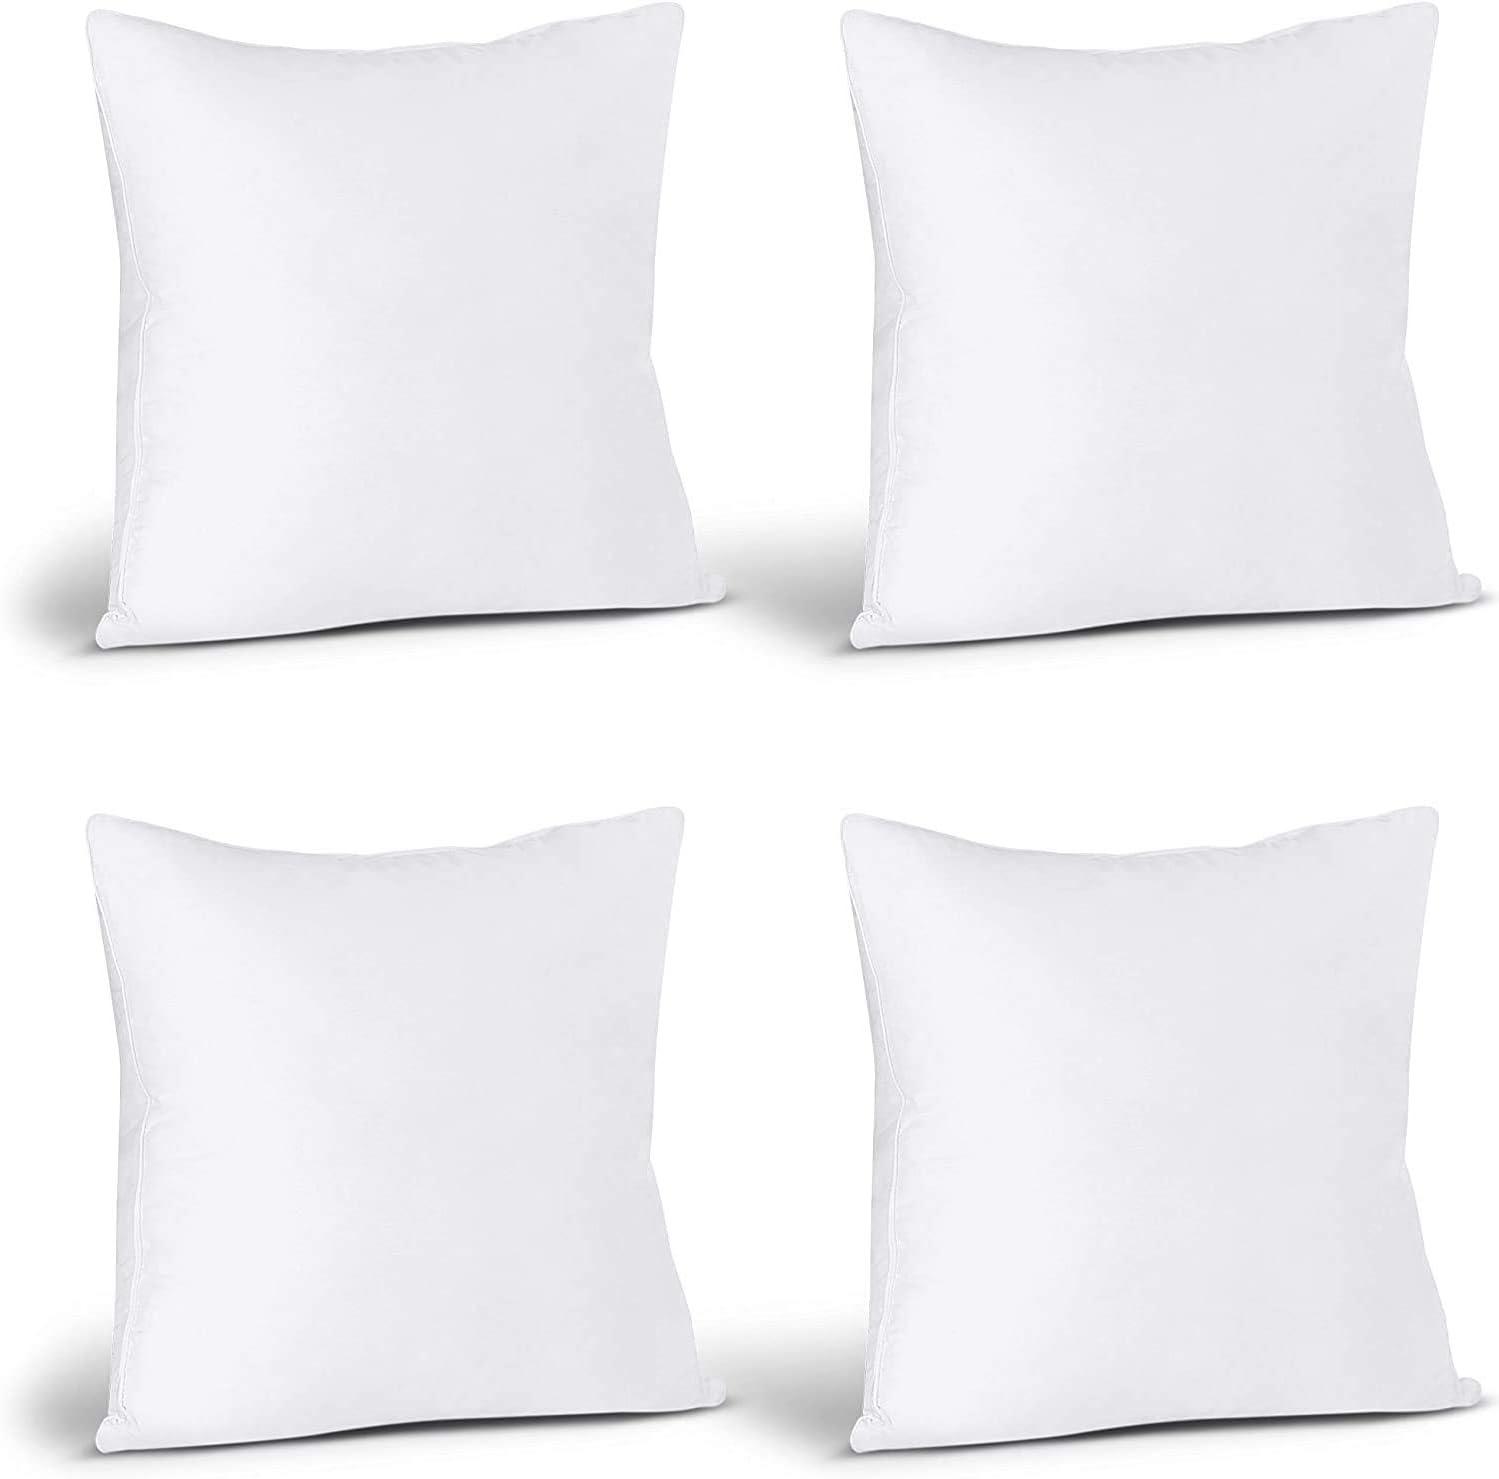 Utopia Bedding Relleno de Cojín 40 x 40 cm (4 Unidades) - Funda de Mezcla de Algodón - Fibra Virgen Siliconada - Almohadas de Sofá (Blanco)